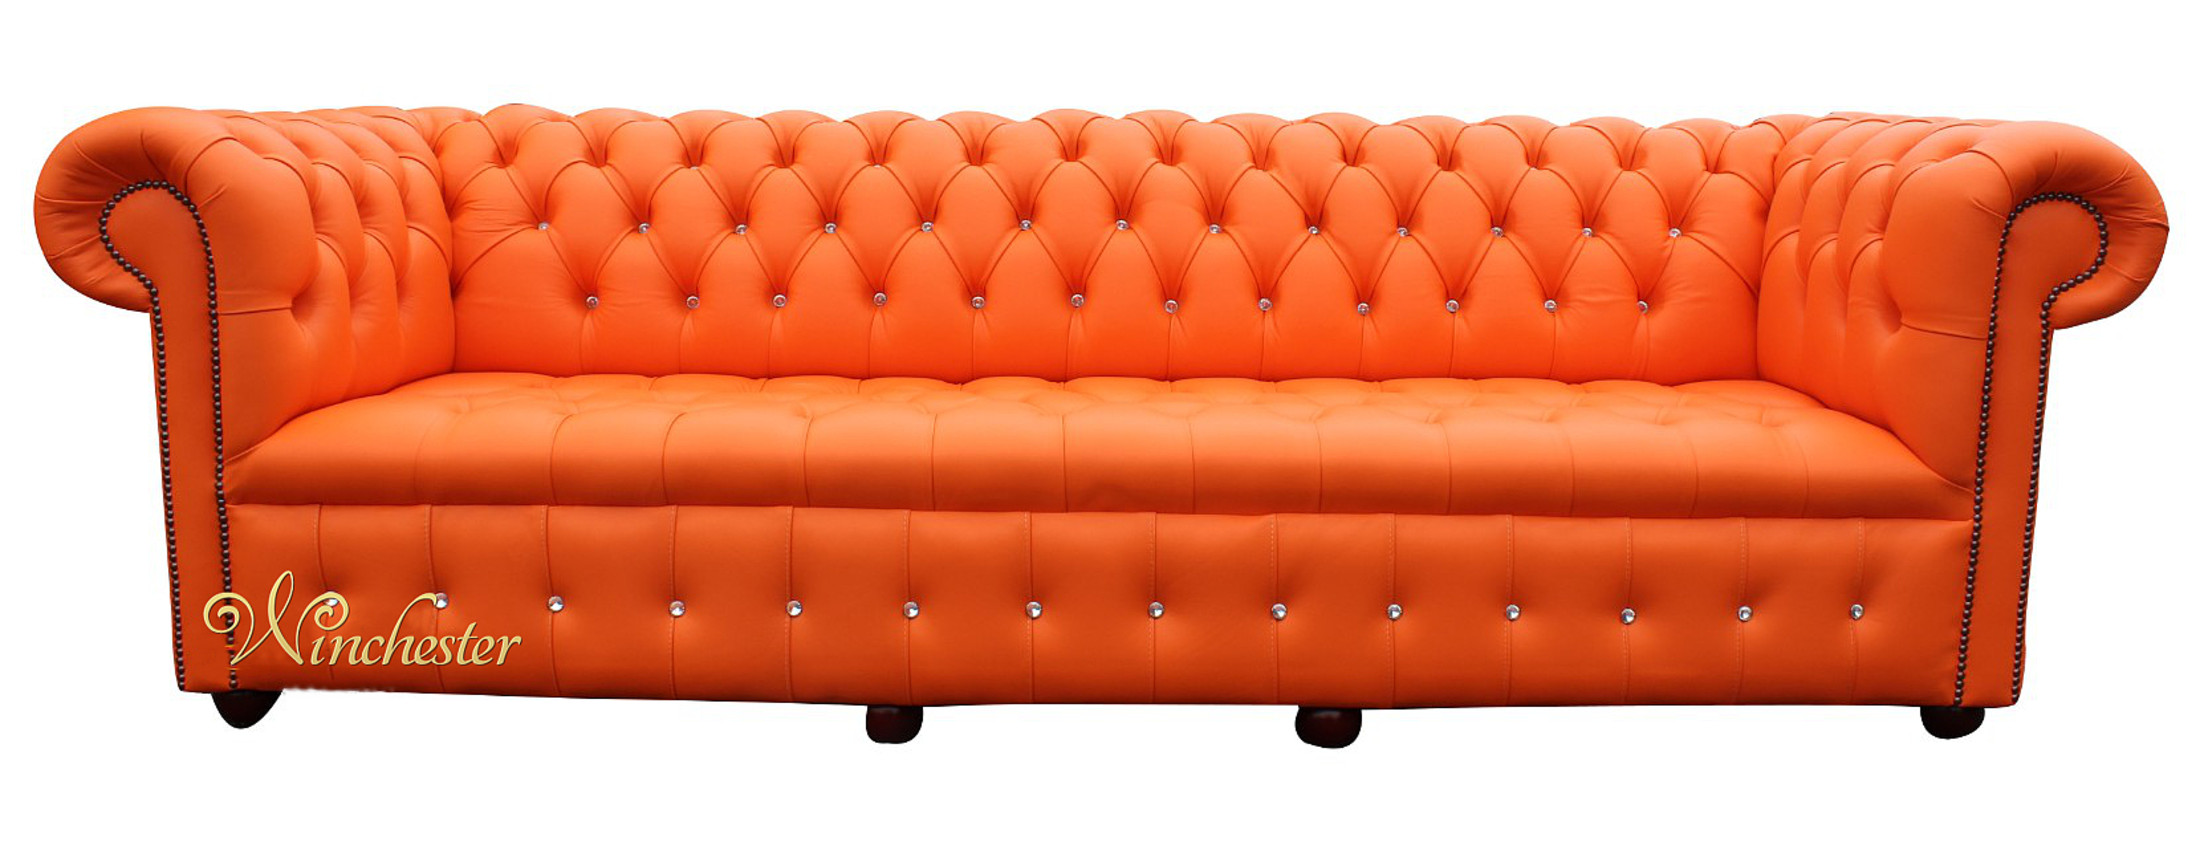 ... Chesterfield Swarovski Crystal 4 Seater Mandarin Orange Leather  ...